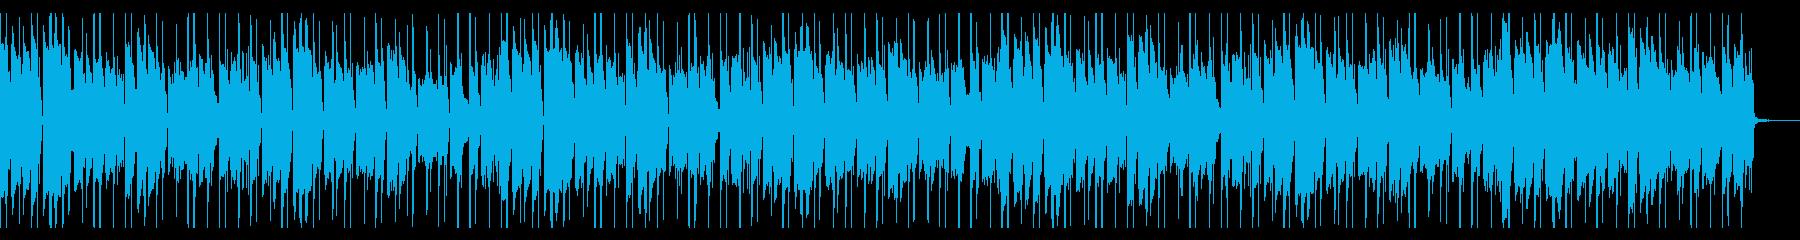 Retro Organ Healing-Natural Landscape's reproduced waveform